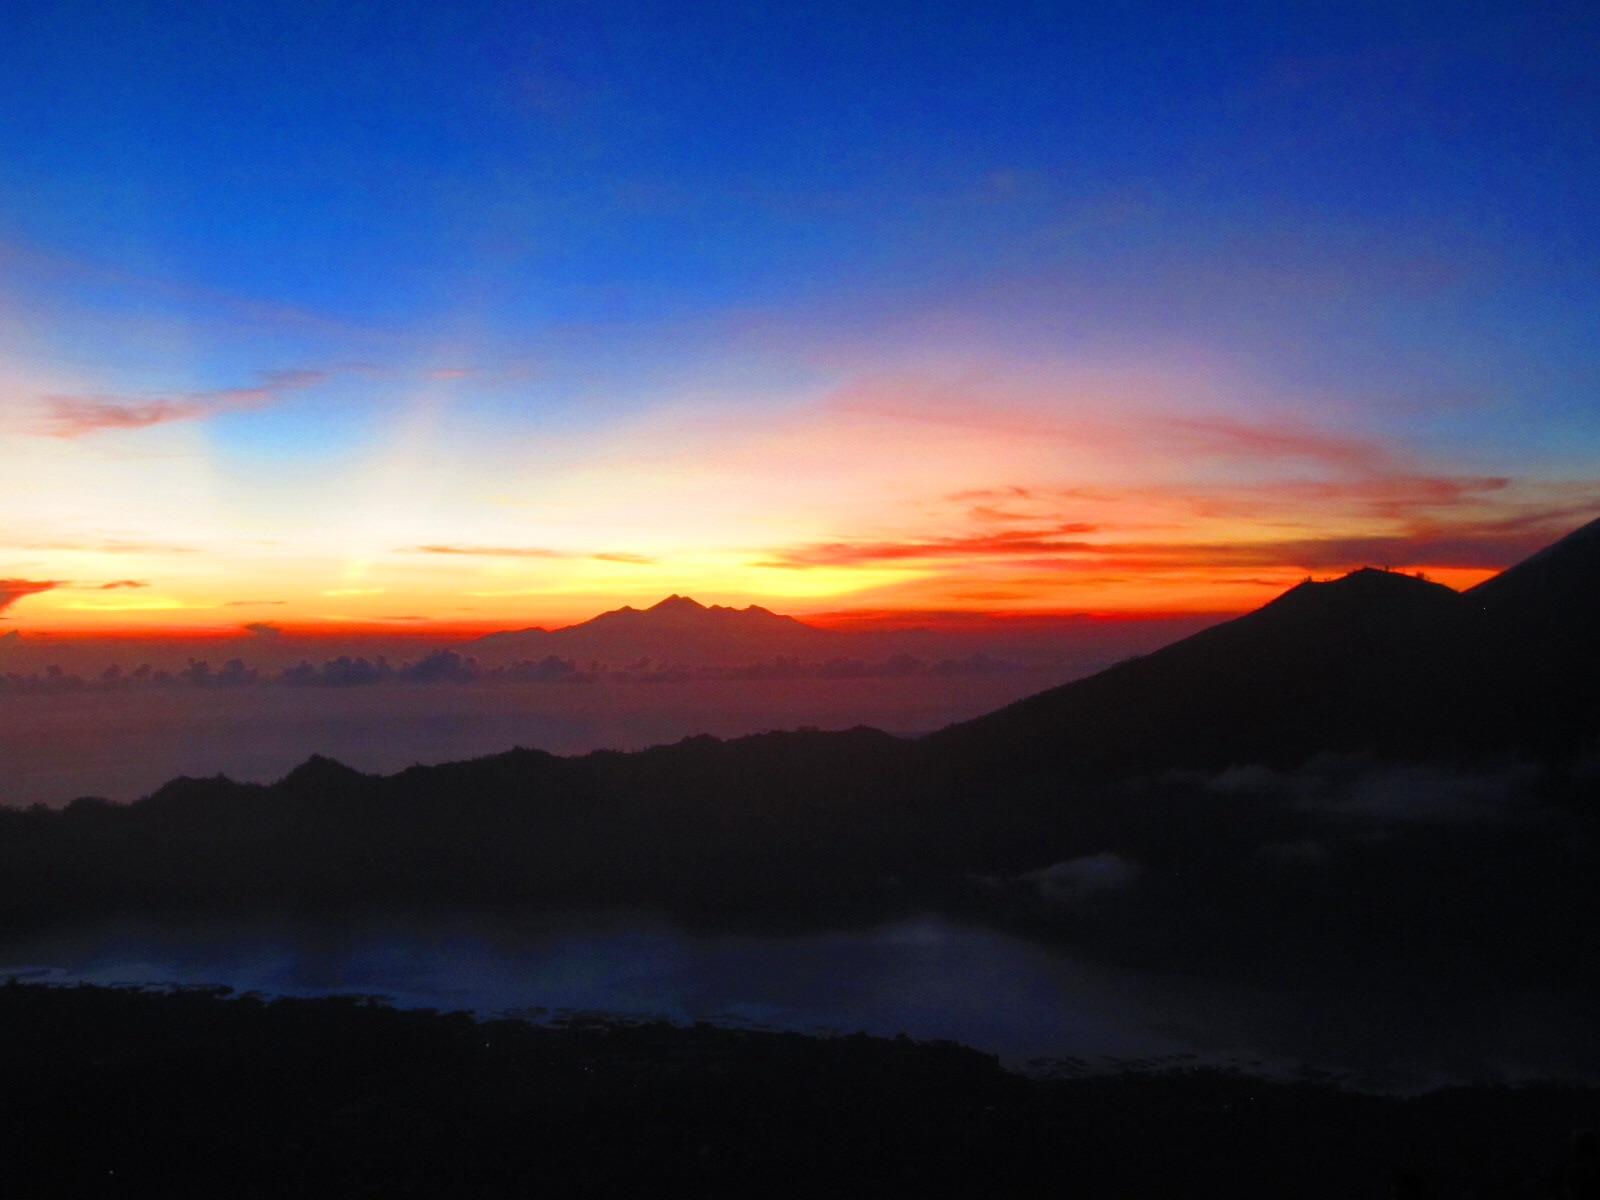 Mountain Batur sunrise. Next stop: Mount Rinjani in the distance...